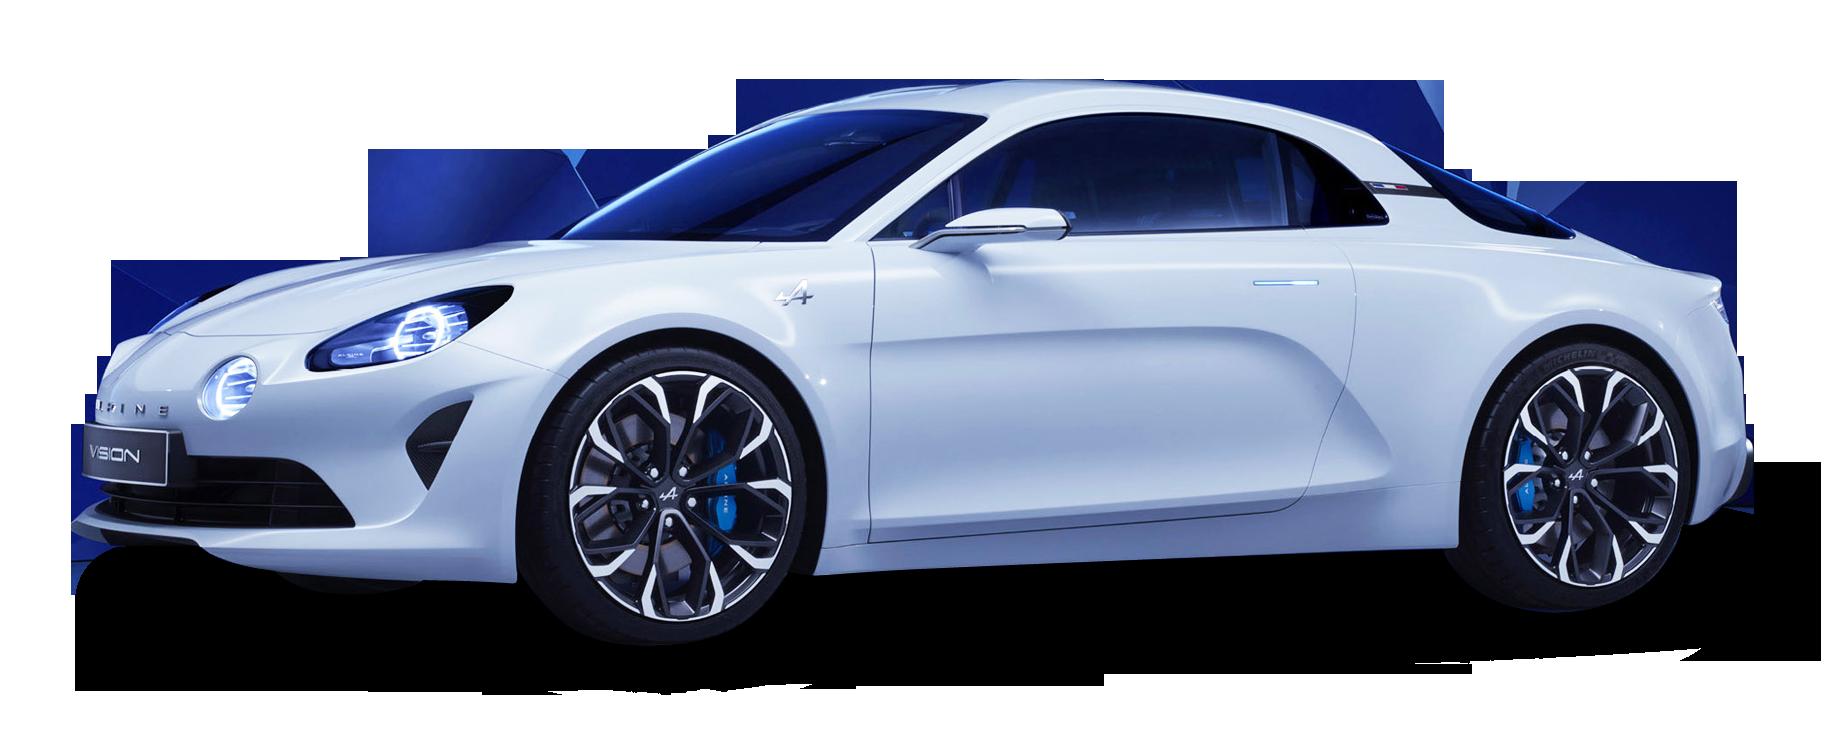 White Renault Alpine Car